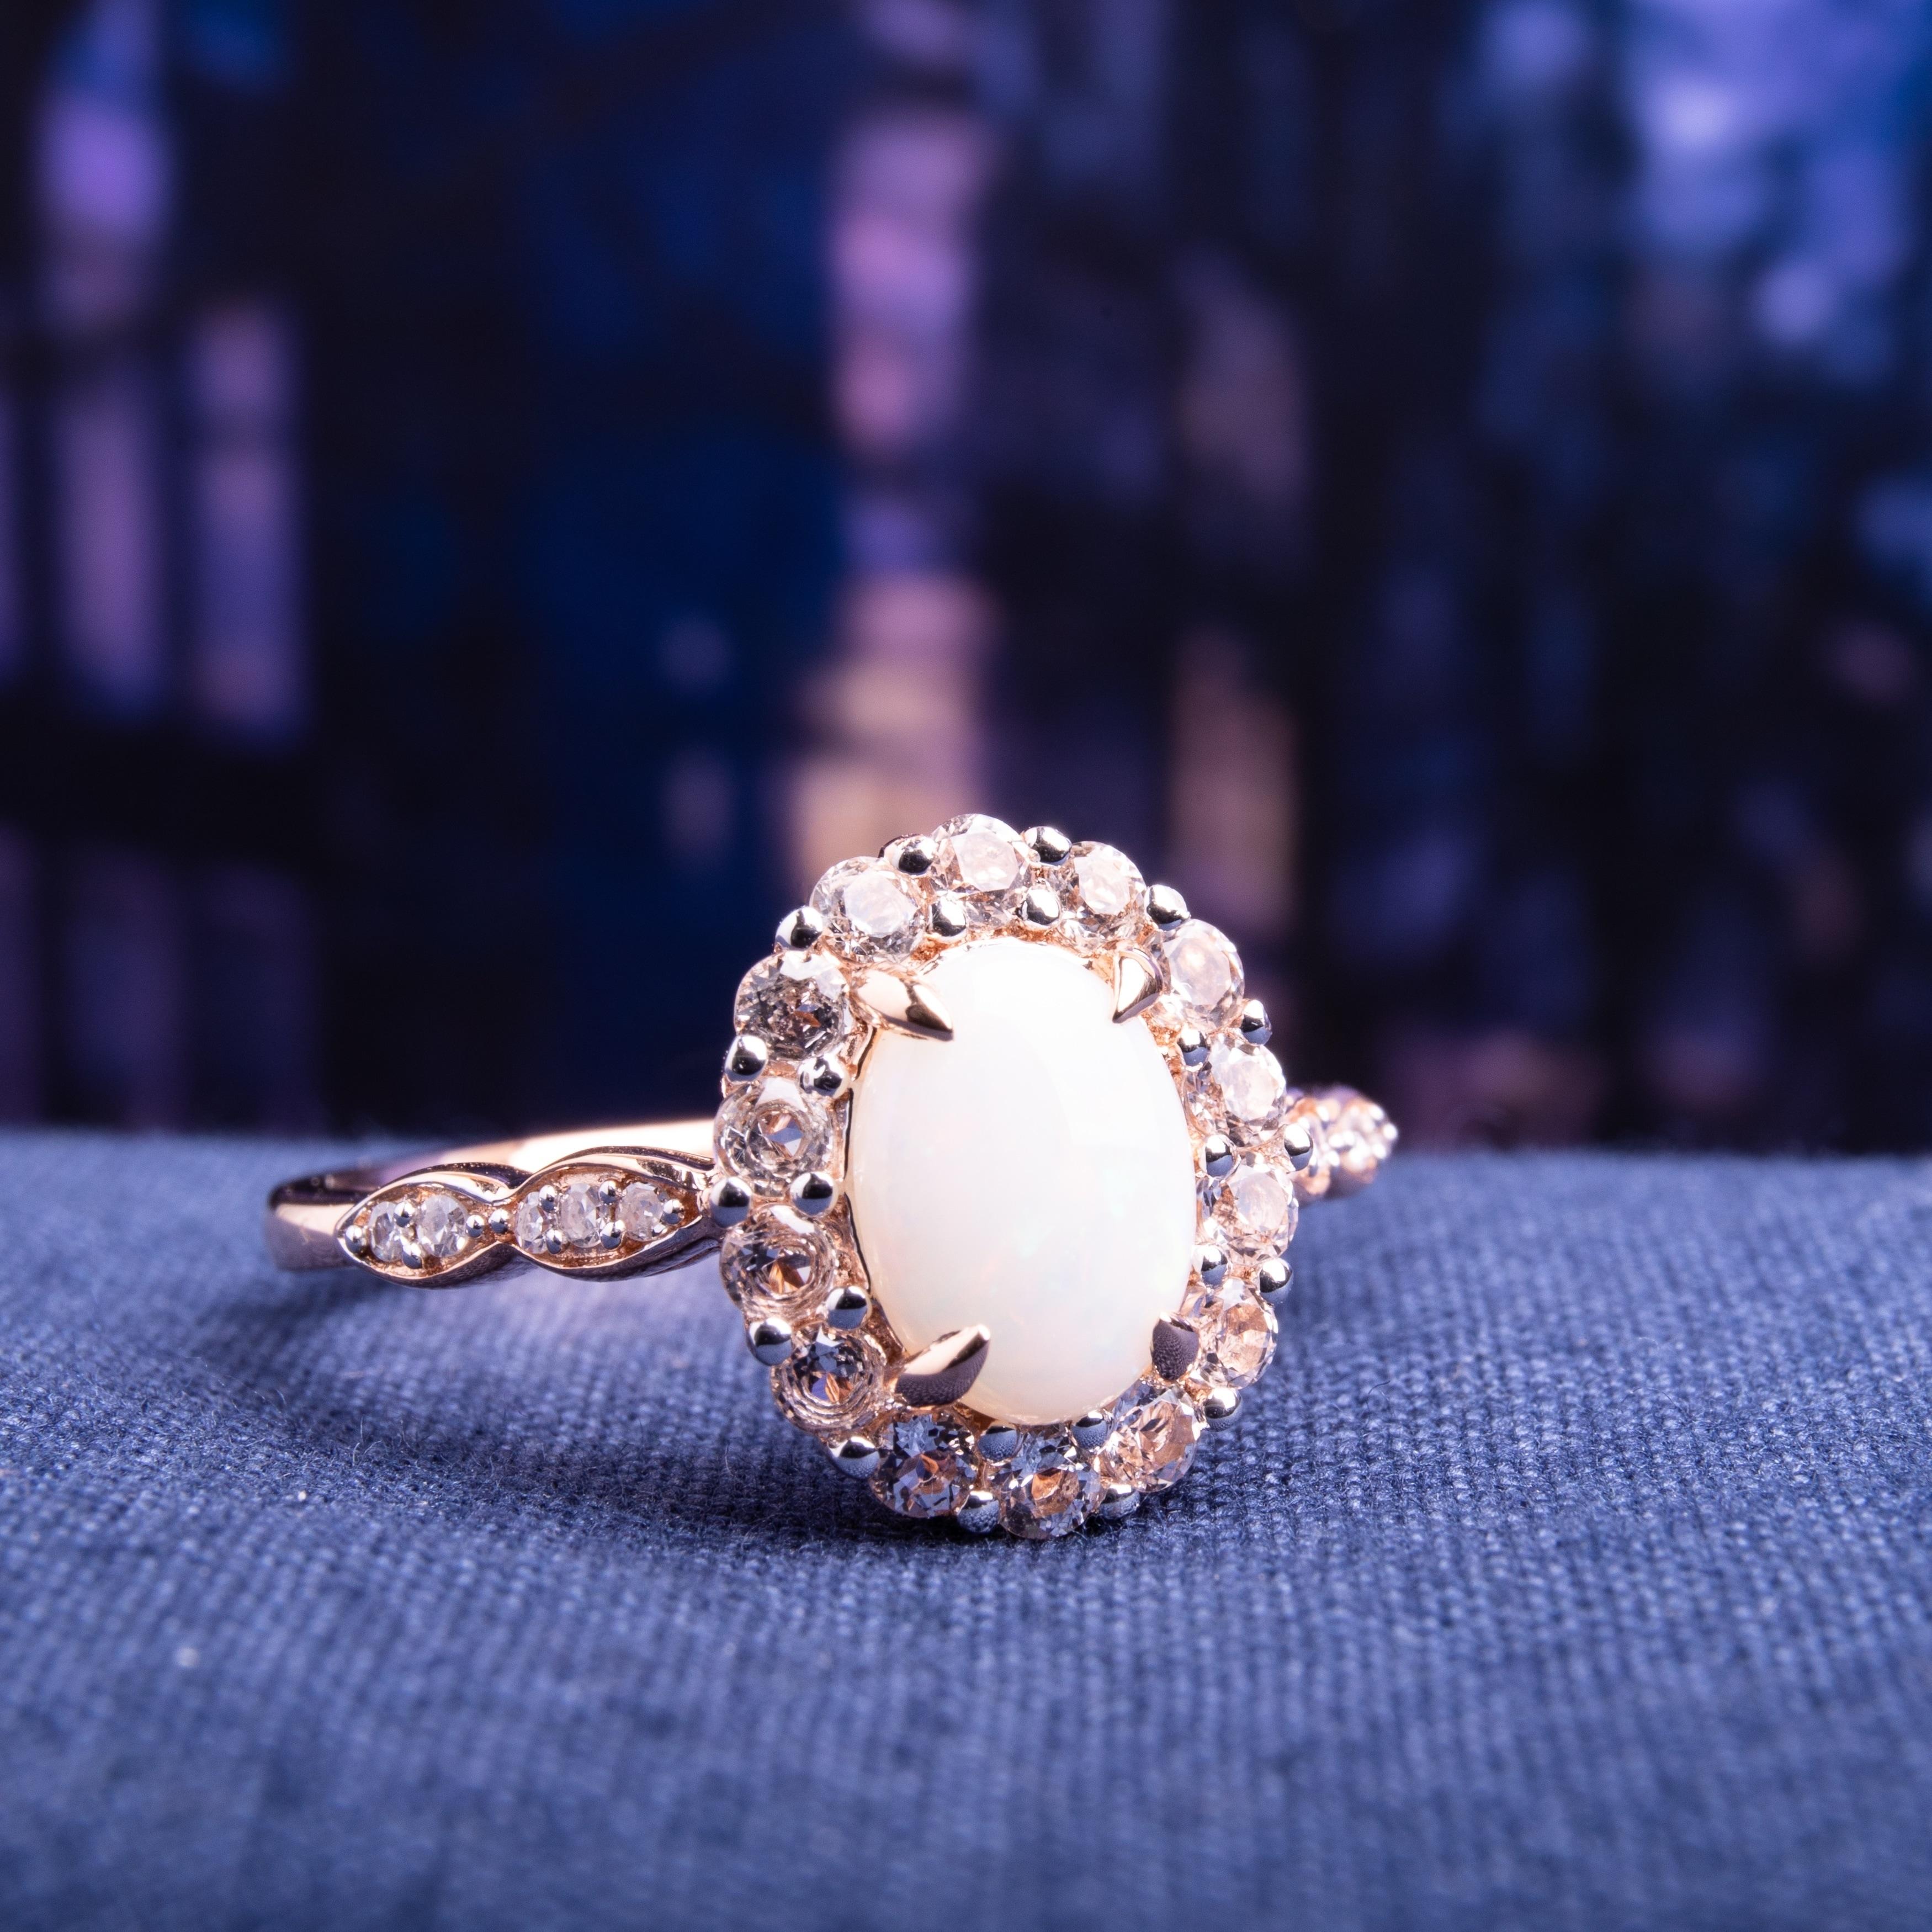 14k Rose Gold Round White Fire Opal Engagement Wedding Ring Fashion Jewelry USA